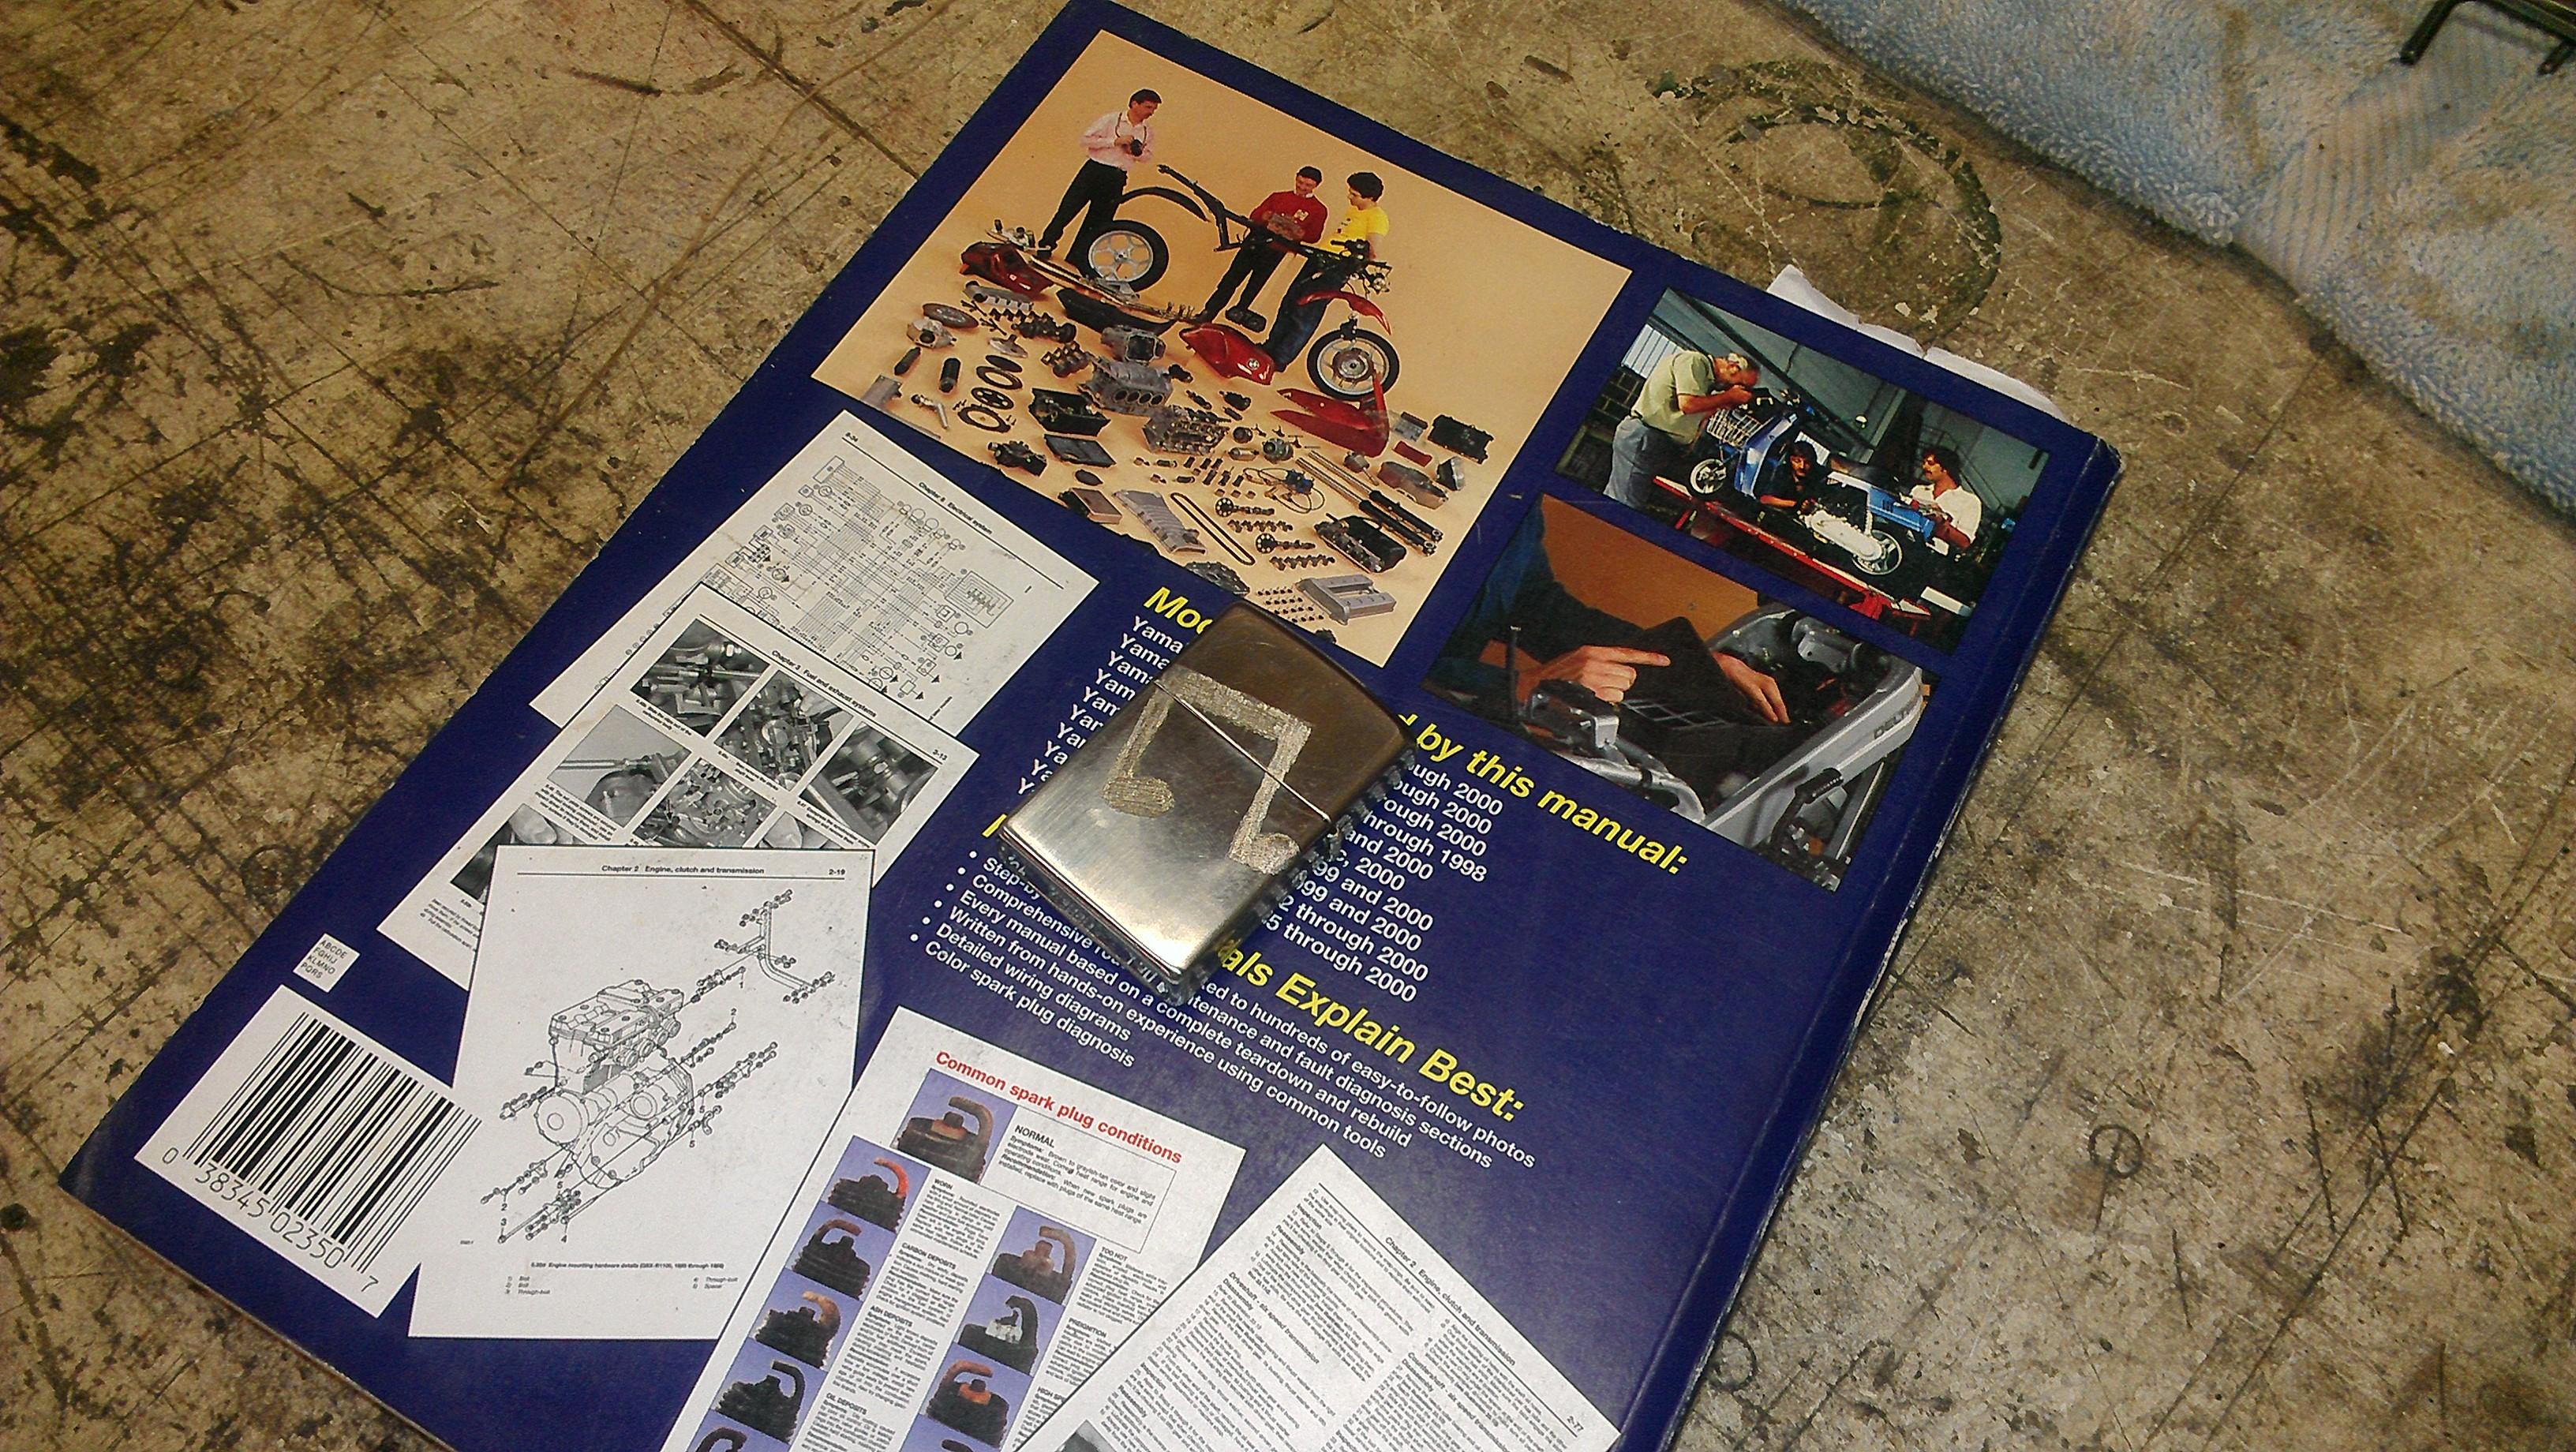 133868 Dj Pon 3 Octavia Melody Safe Vinyl Scratch Zippo Yam Wiring Diagram Uploaded